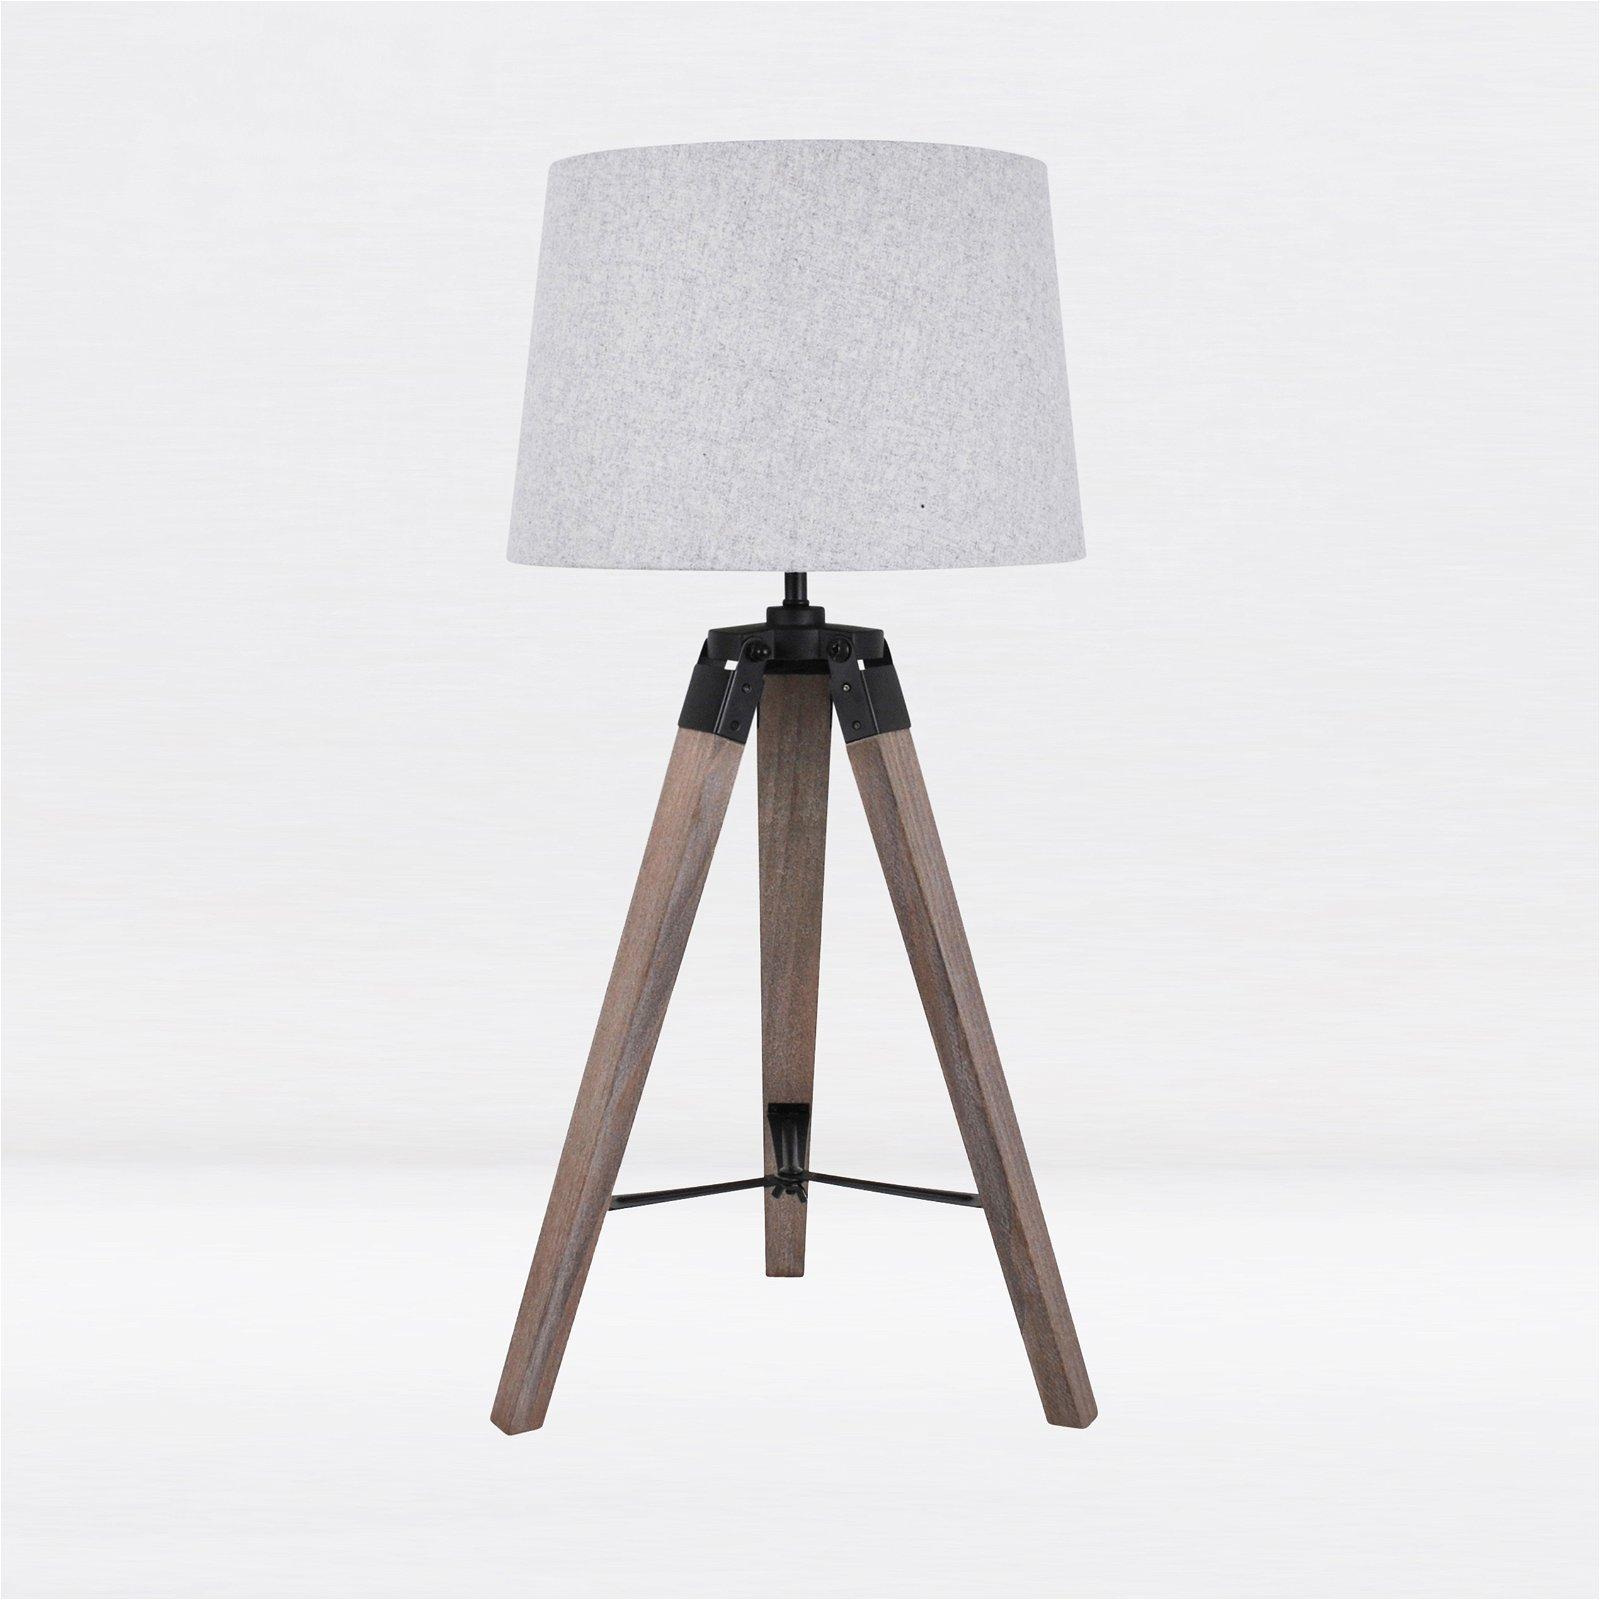 thumbnail 2 - Grey Wash Tripod Wood Table or Floor Lamp Black Painted Metal and Grey Shade